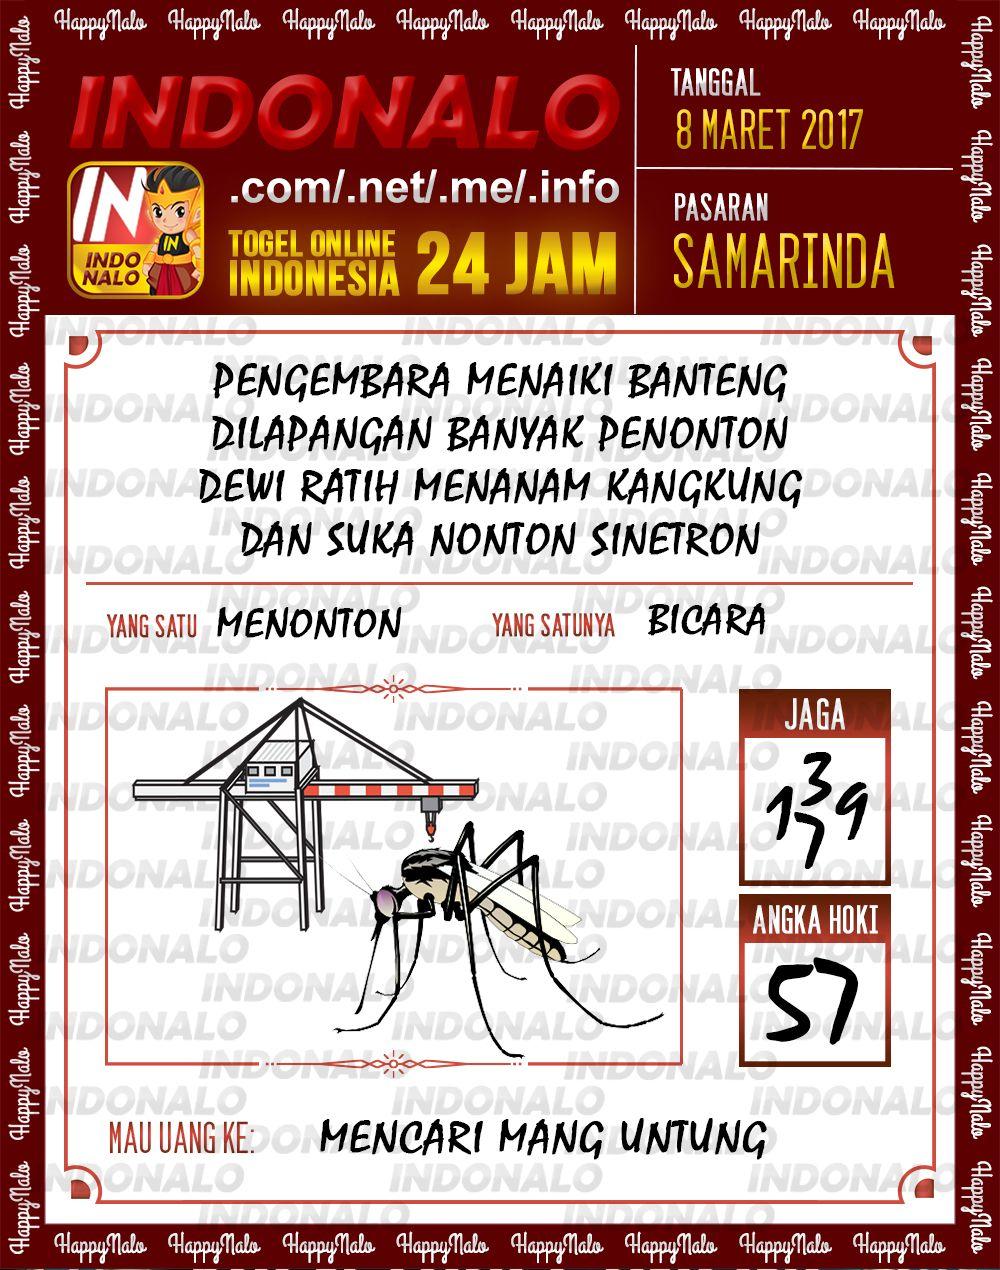 Angka Hoki 4D Togel Wap Online Indonalo Samarinda 8 Maret